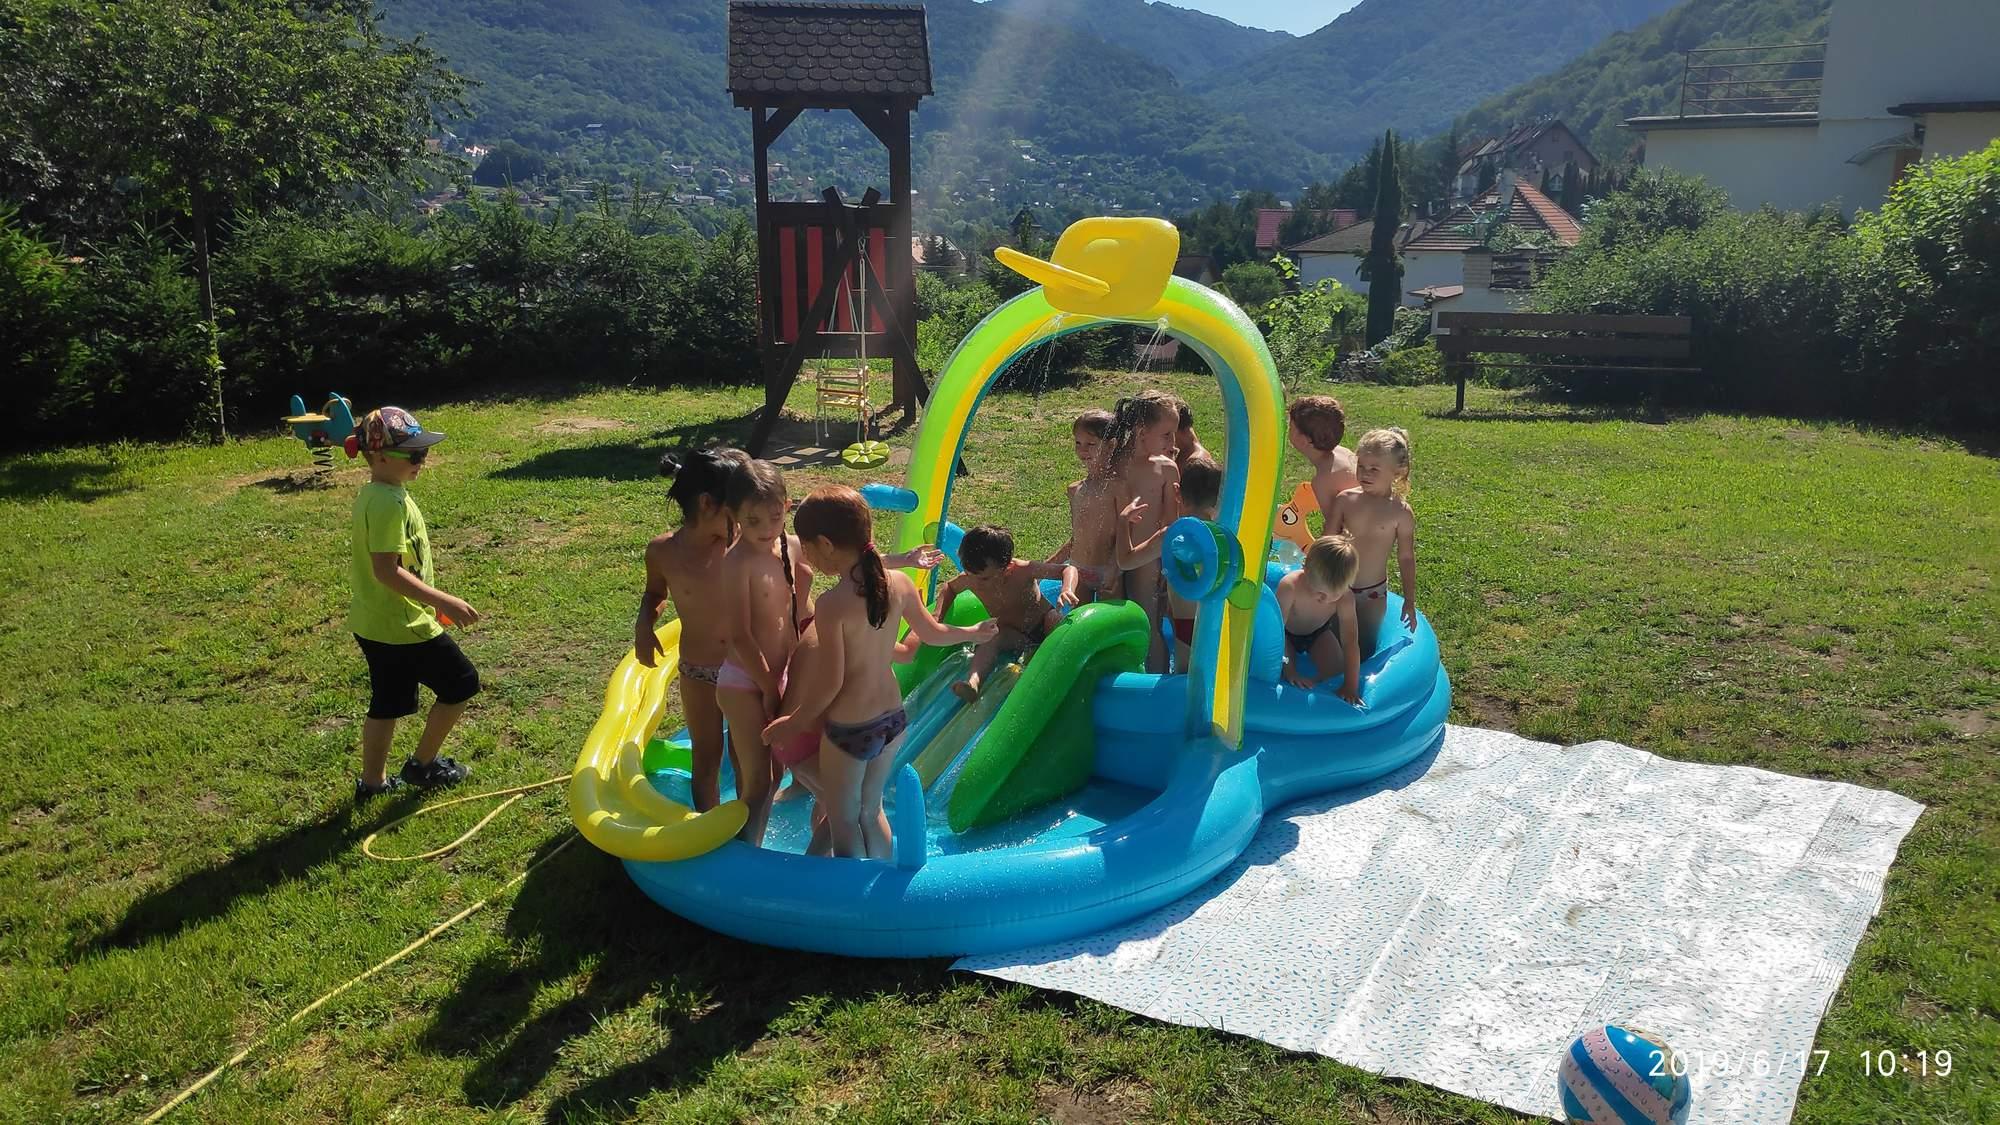 .rajce.idnes.cz children 19